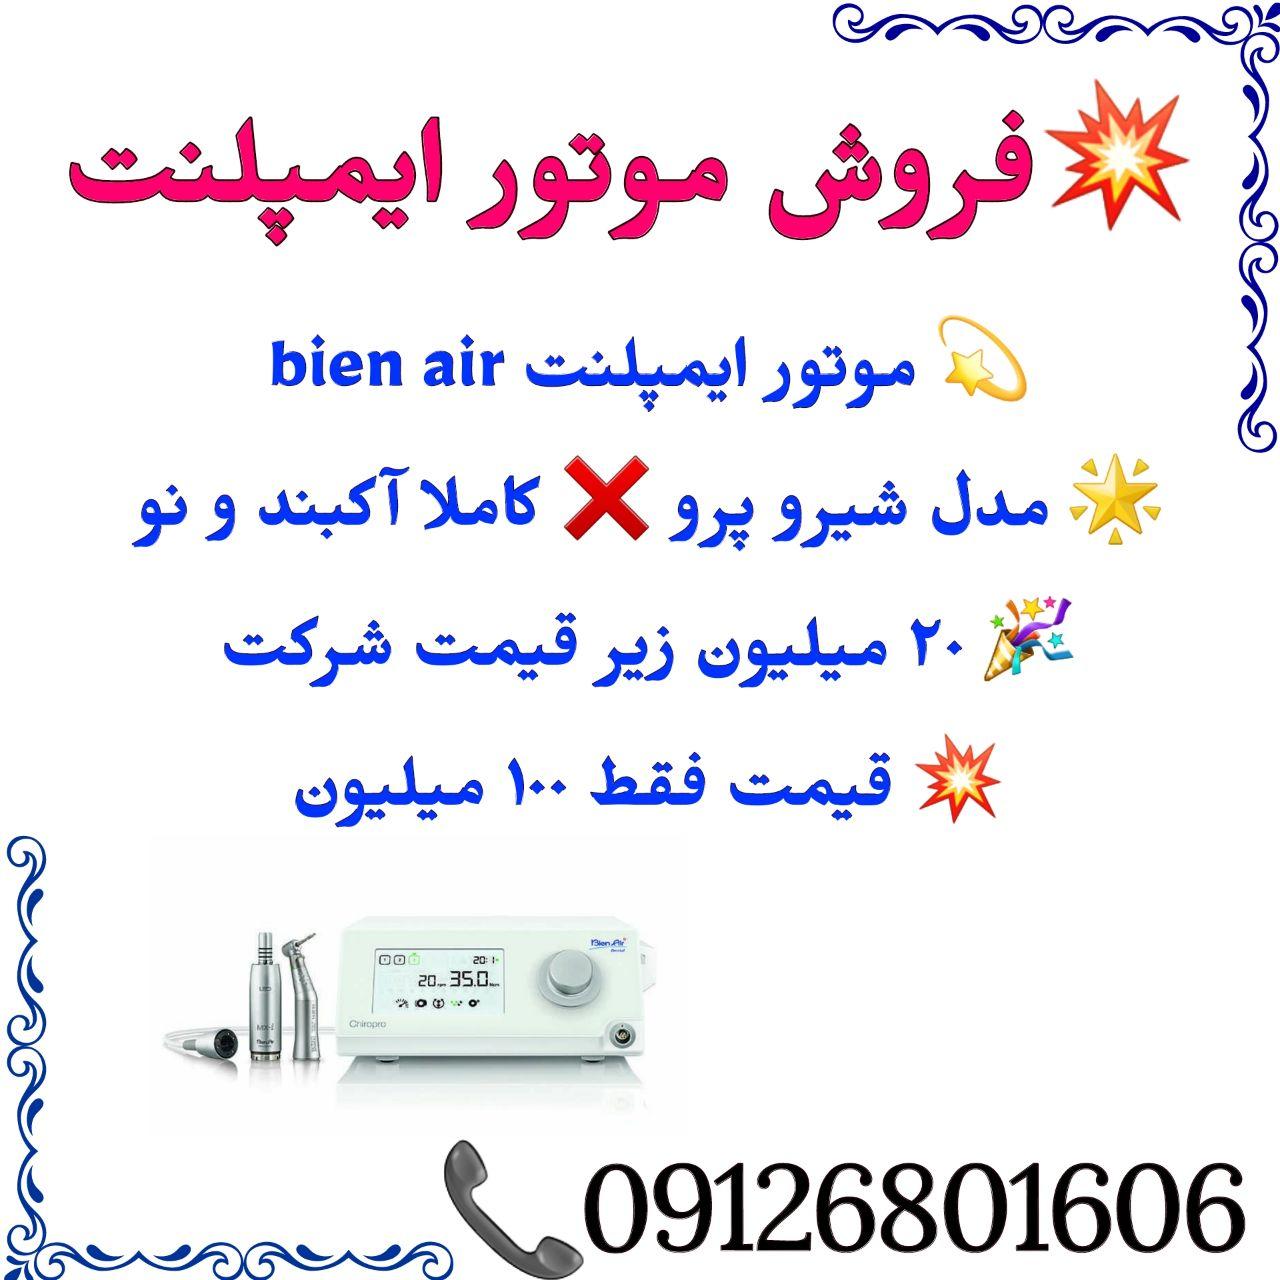 تهران: فروش موتور ایمپلنت